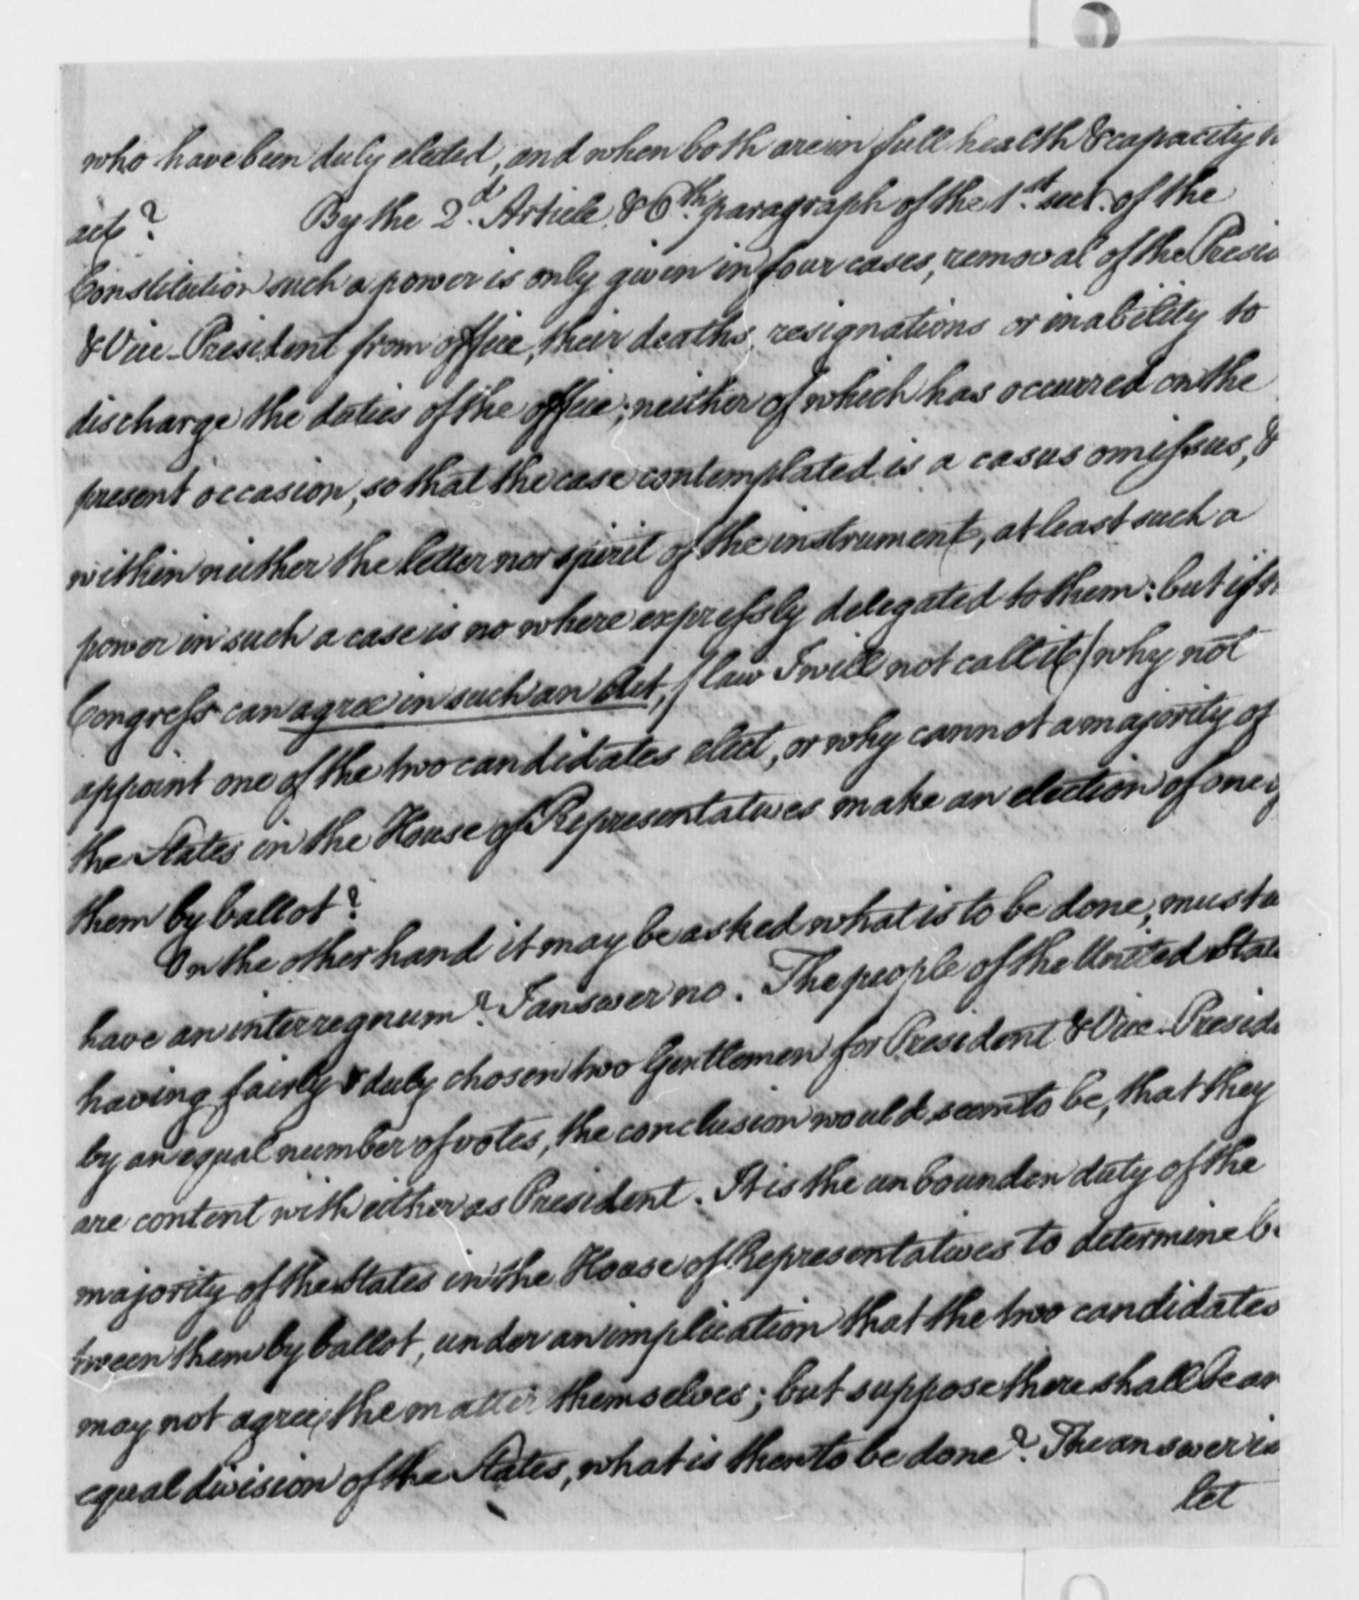 Thomas McKean to Thomas Jefferson, January 10, 1801